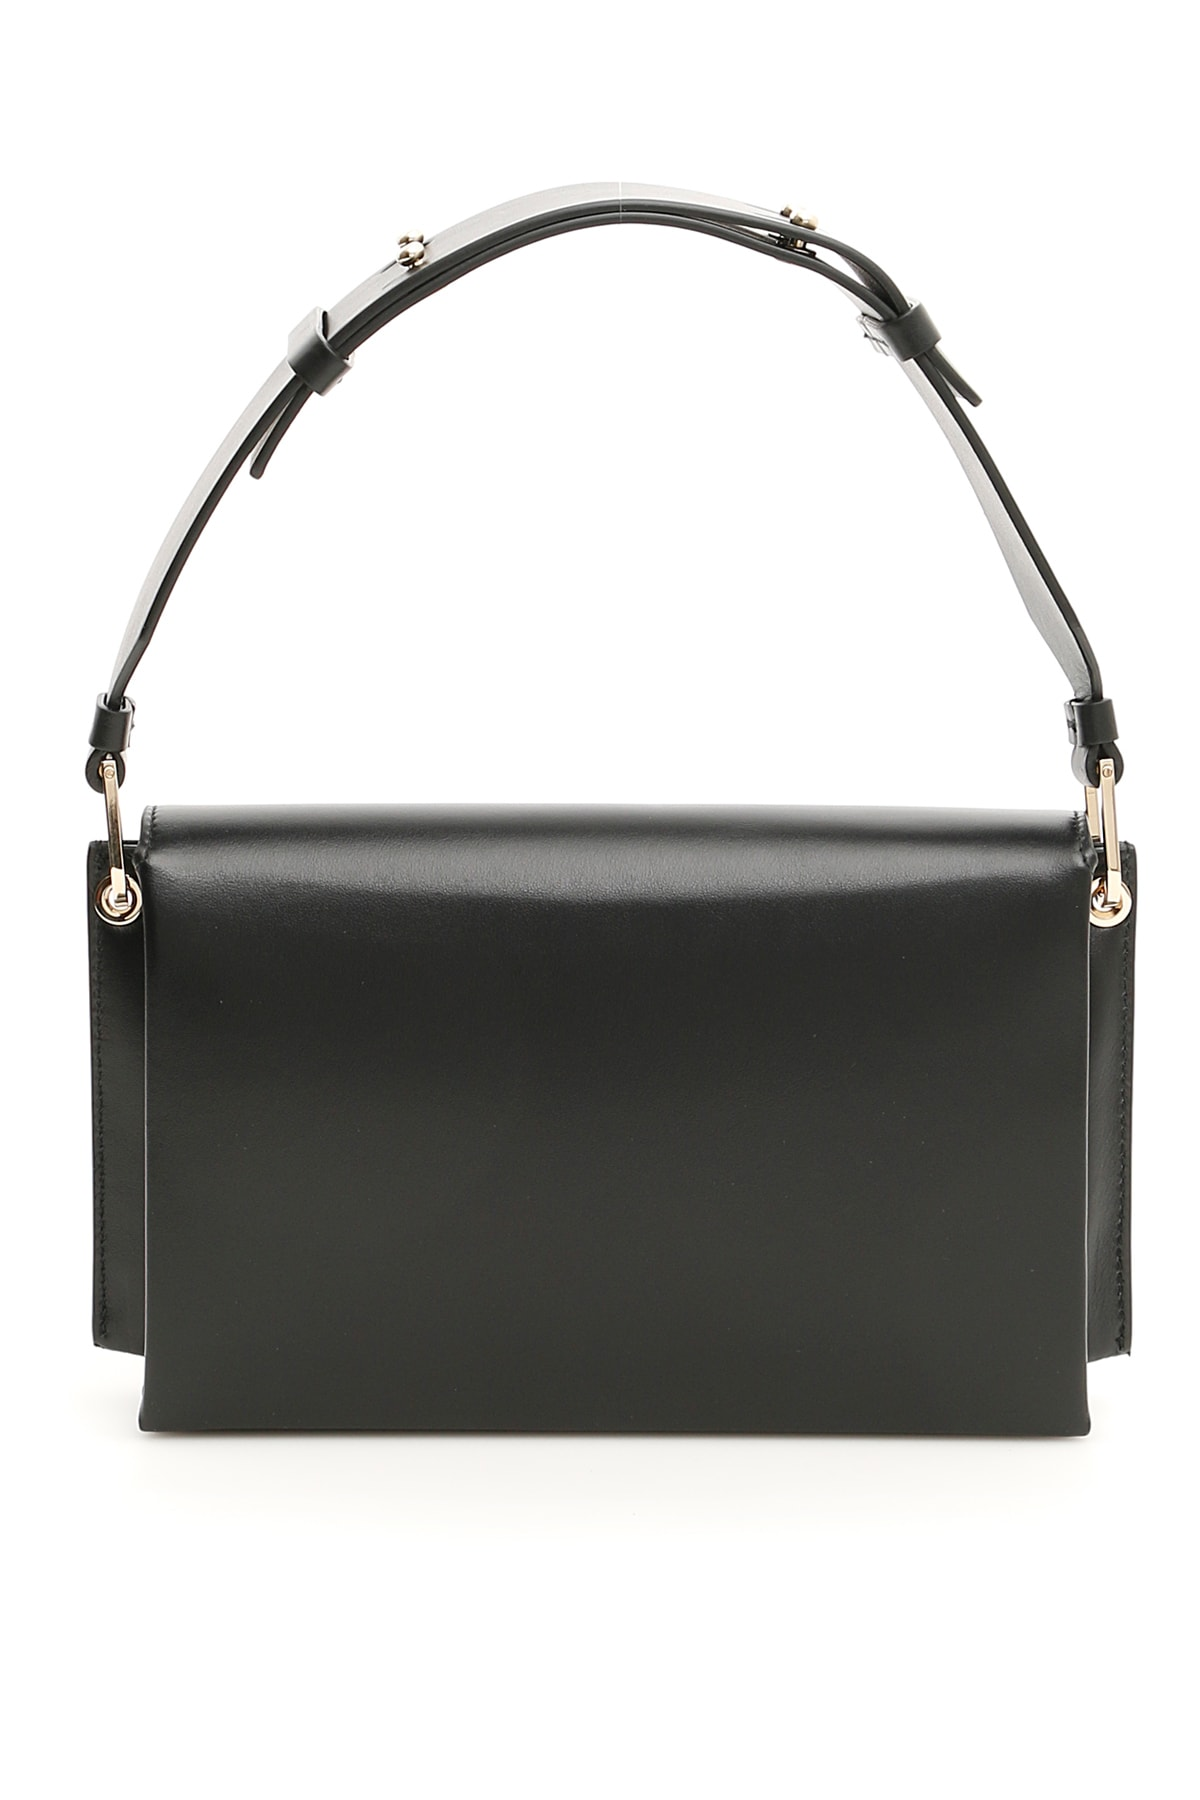 e109bf8630d Lanvin Lanvin Leather Pixel-it Bag - BLACK (Black) - 10765041 | italist